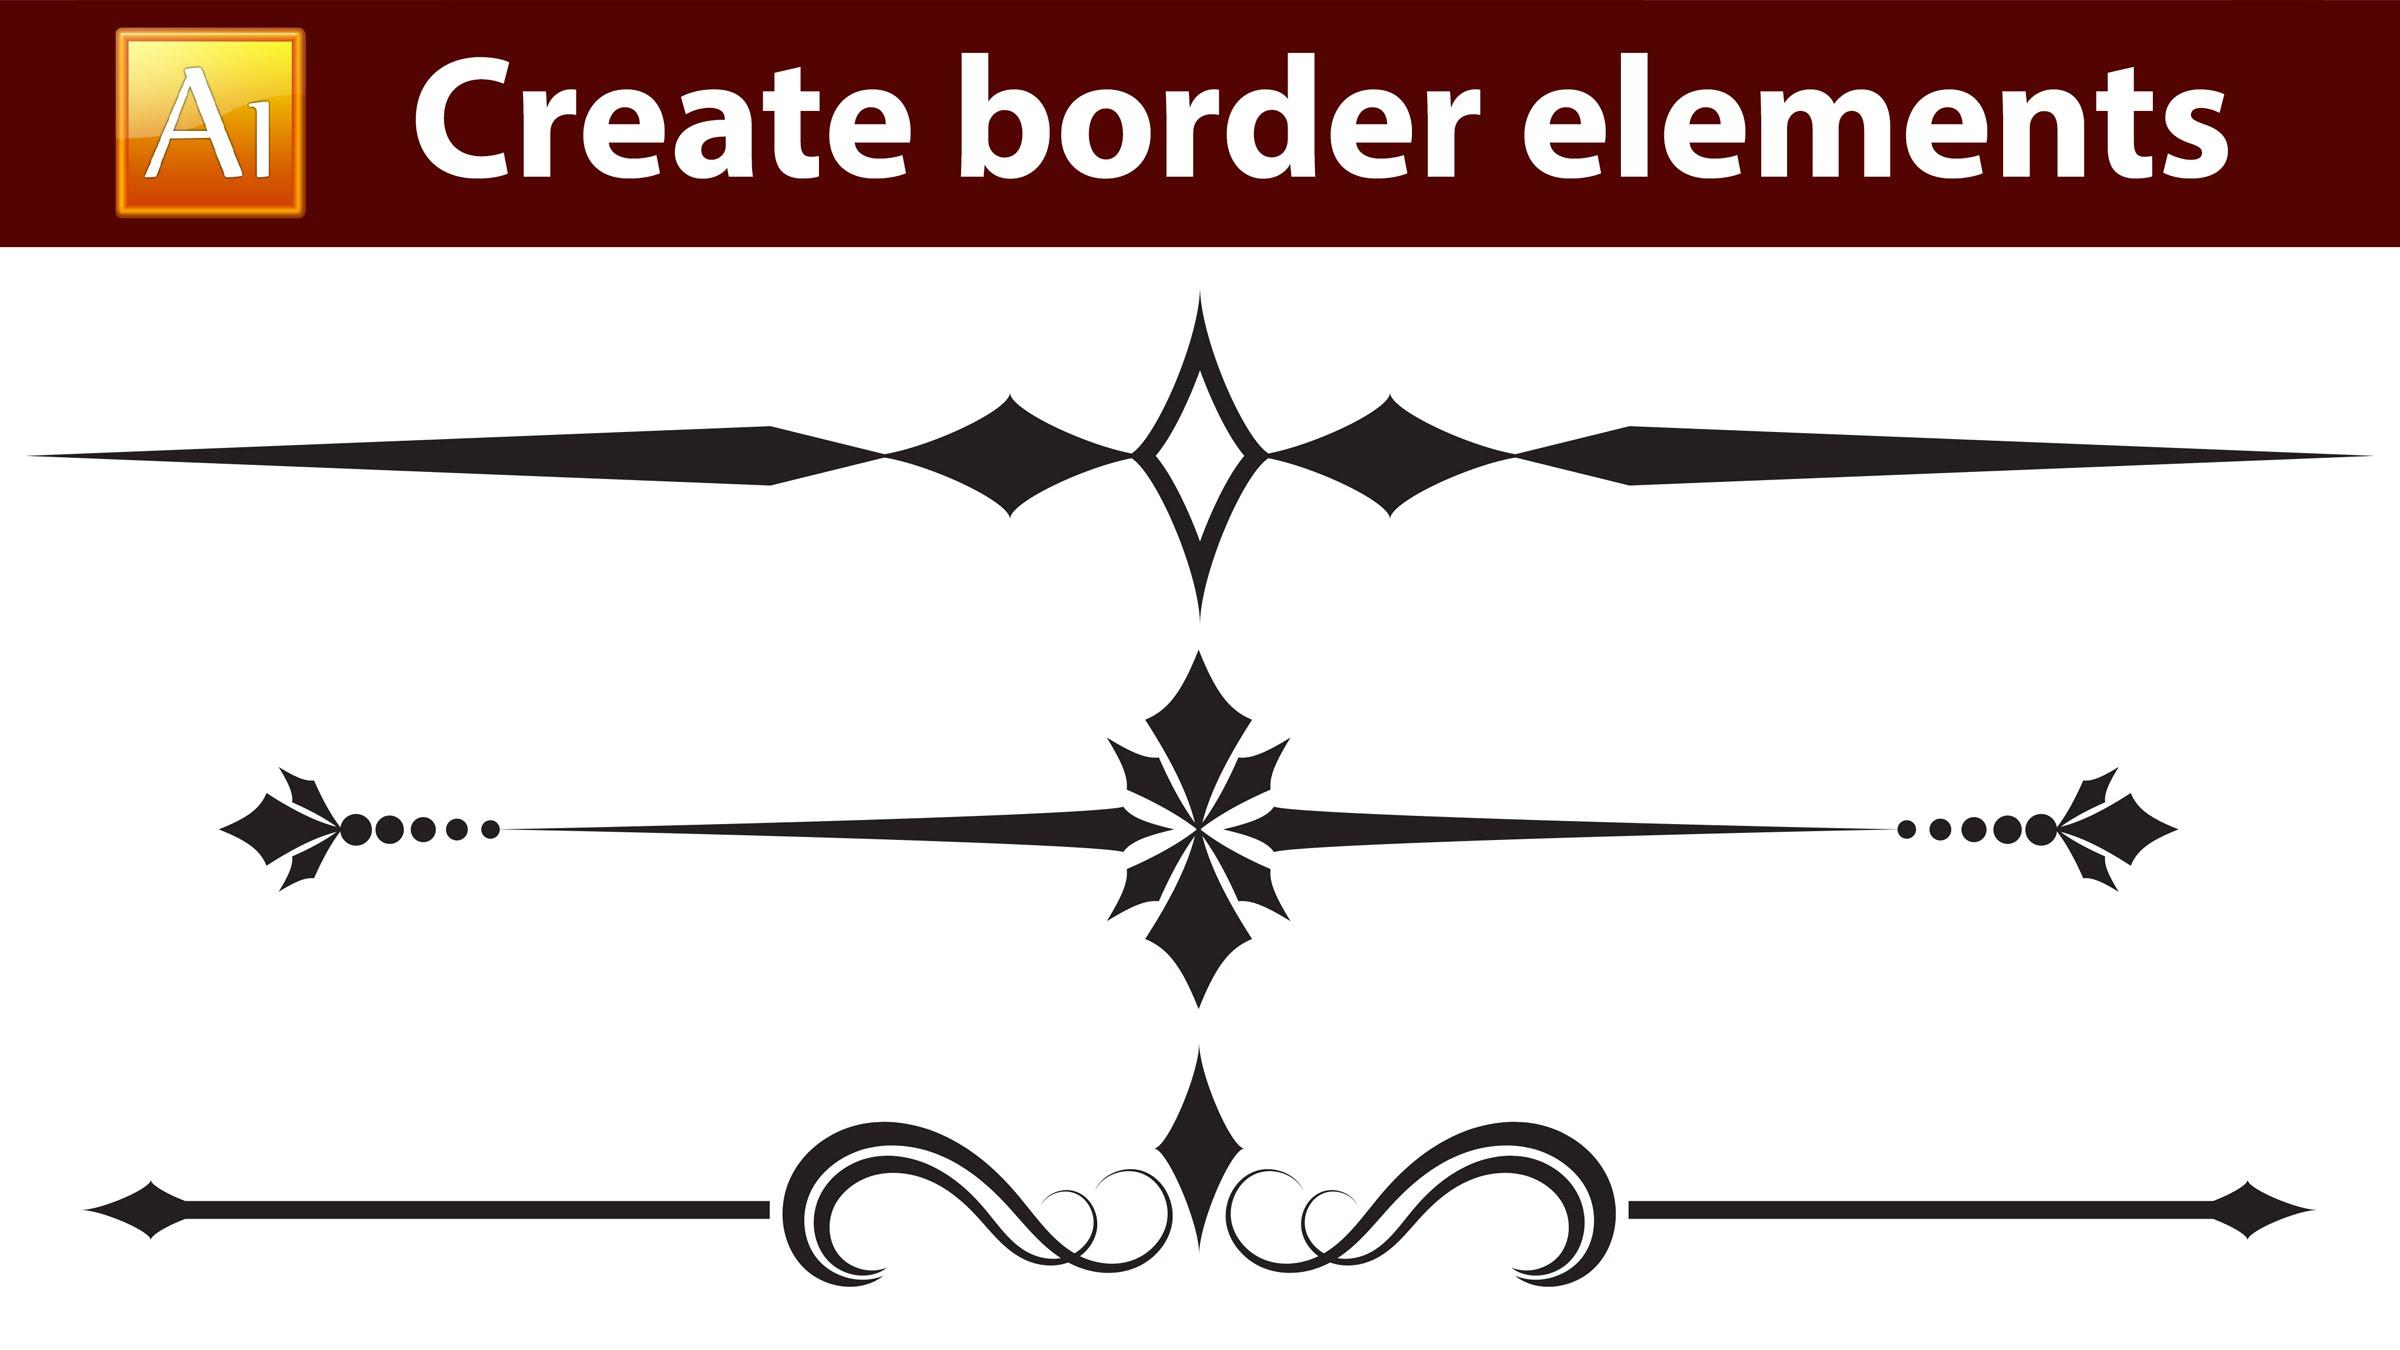 Free Vector Borders For Illustrator at GetDrawings com